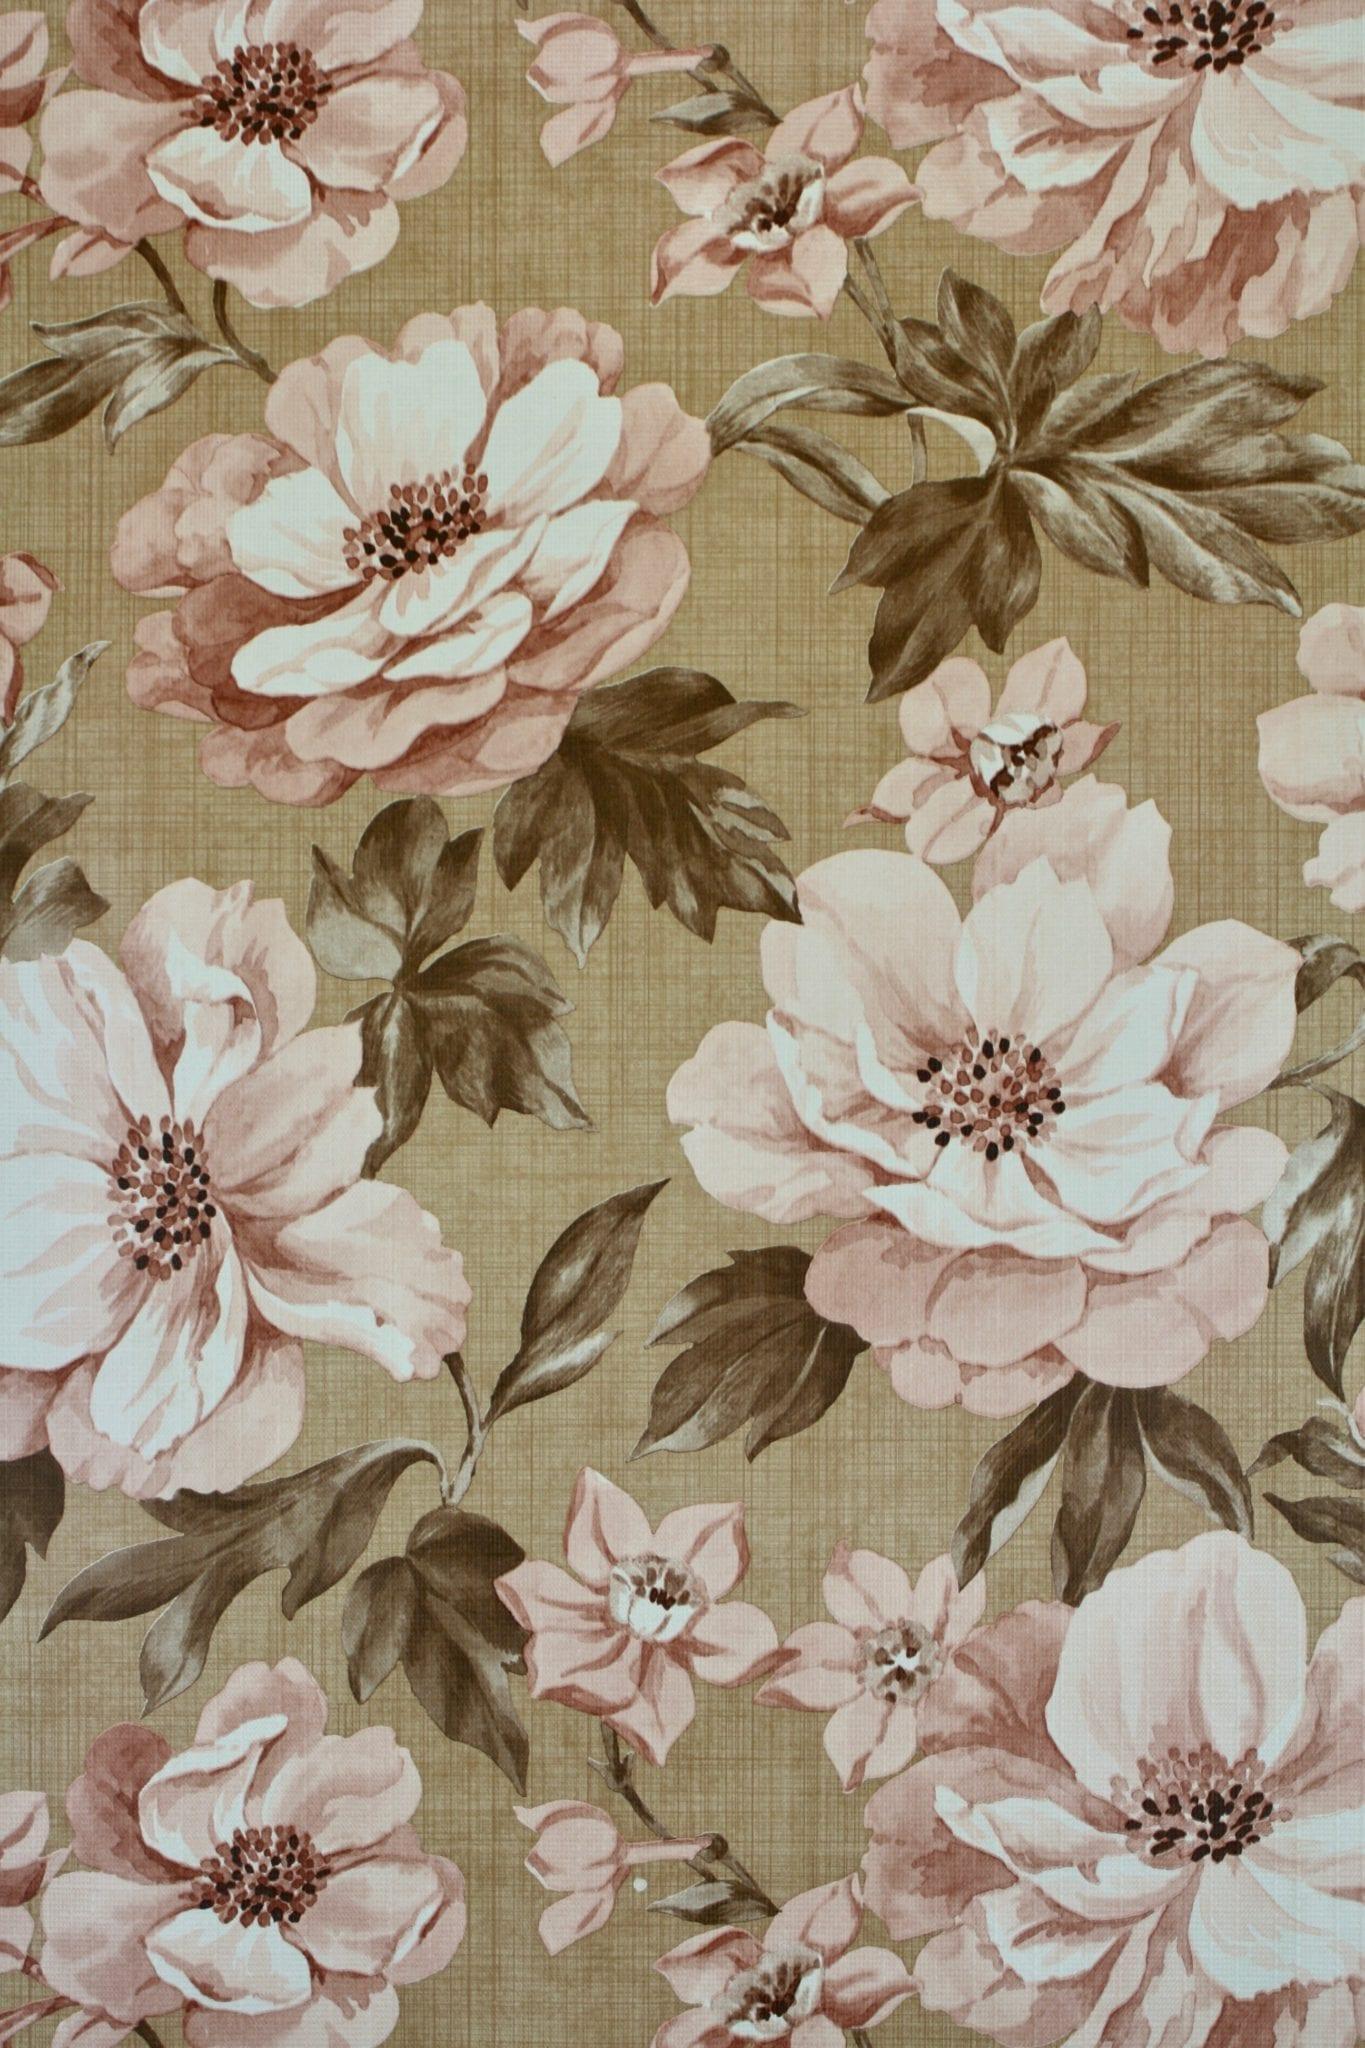 Vintage Floral Wallpapers - Wallpaper Cave